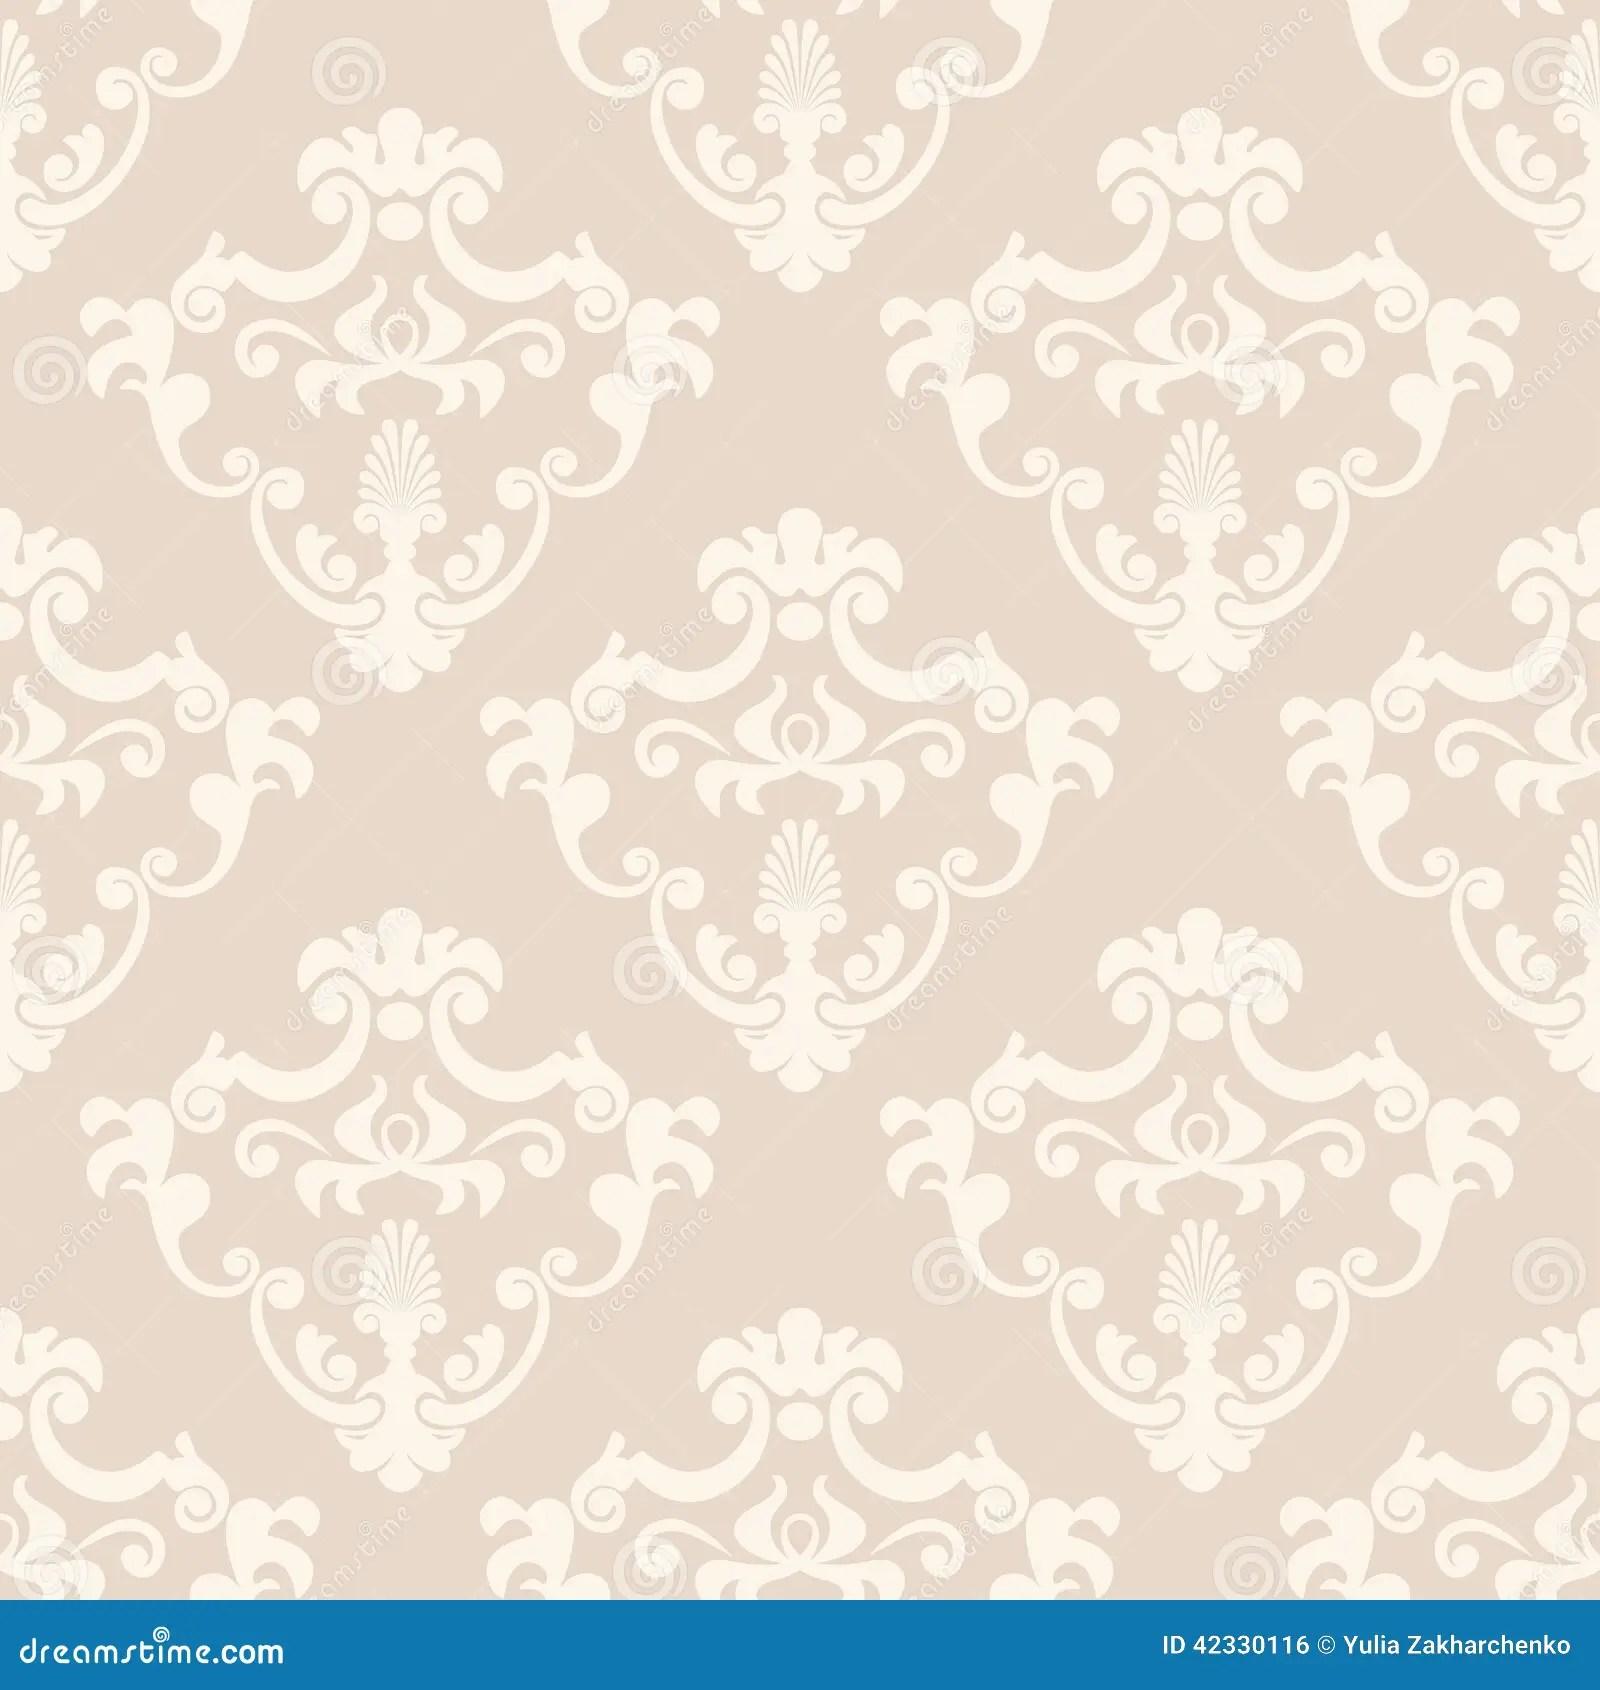 Purple And Black Wallpaper Designs Seamless Classic Design Vector Wallpaper Stock Vector